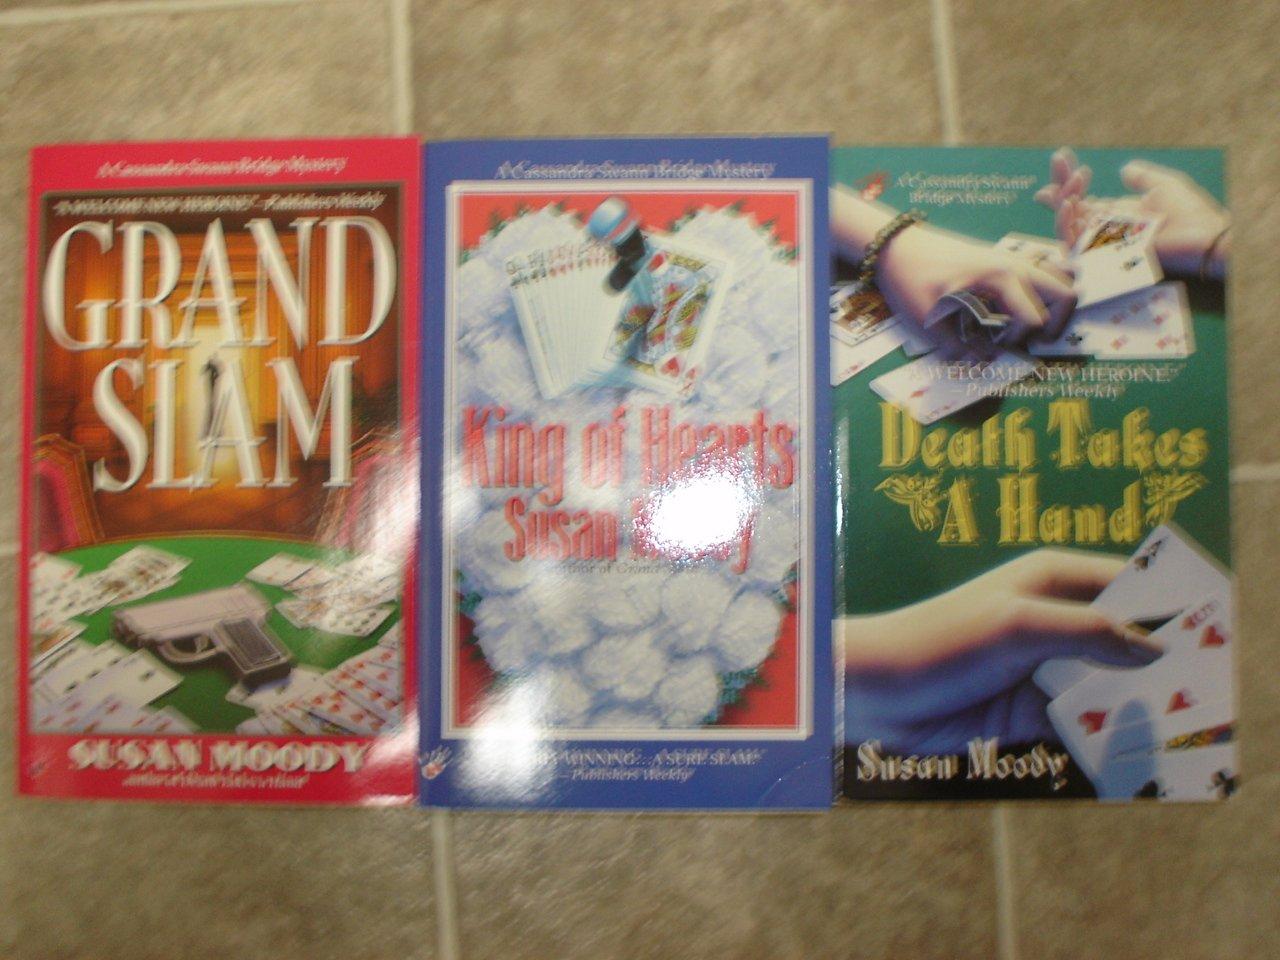 Susan Moody lot of 3 pb mystery novels books cozy Cassandra Swan Bridge Berkley Prime Crime